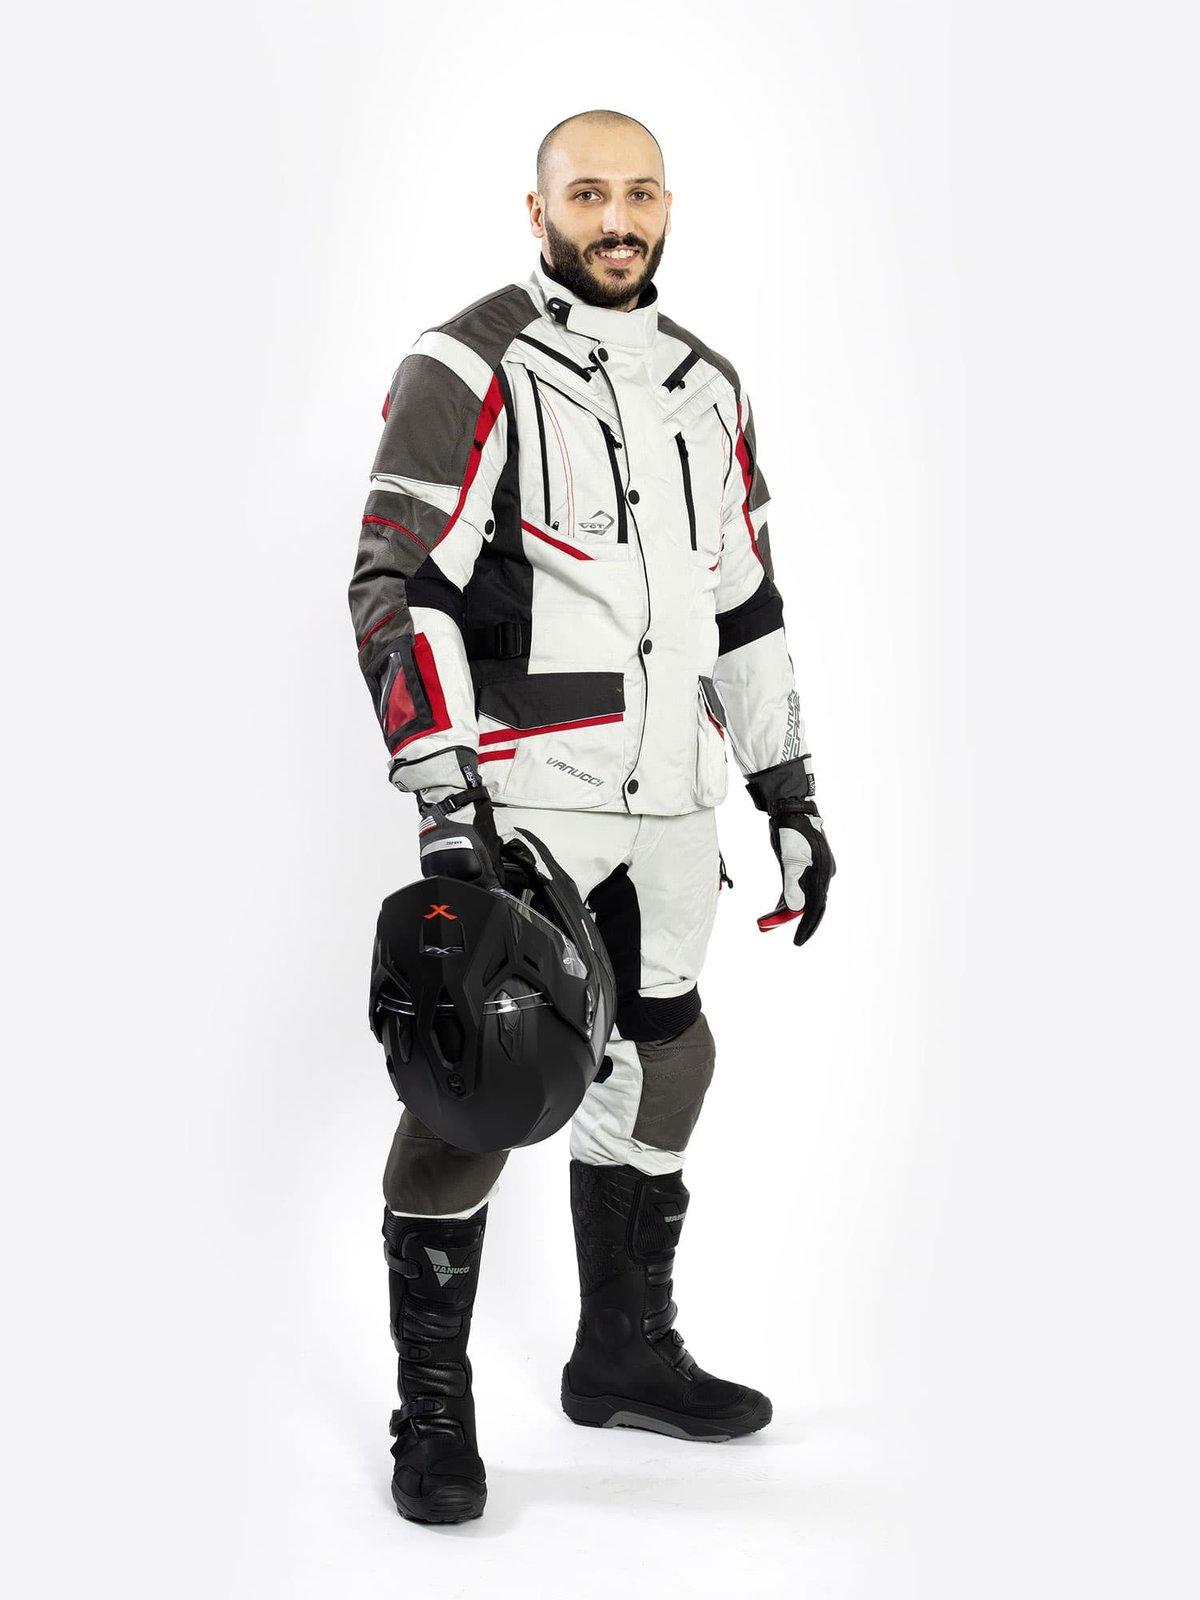 Typberatung - Reiseenduro Motorradfahrer